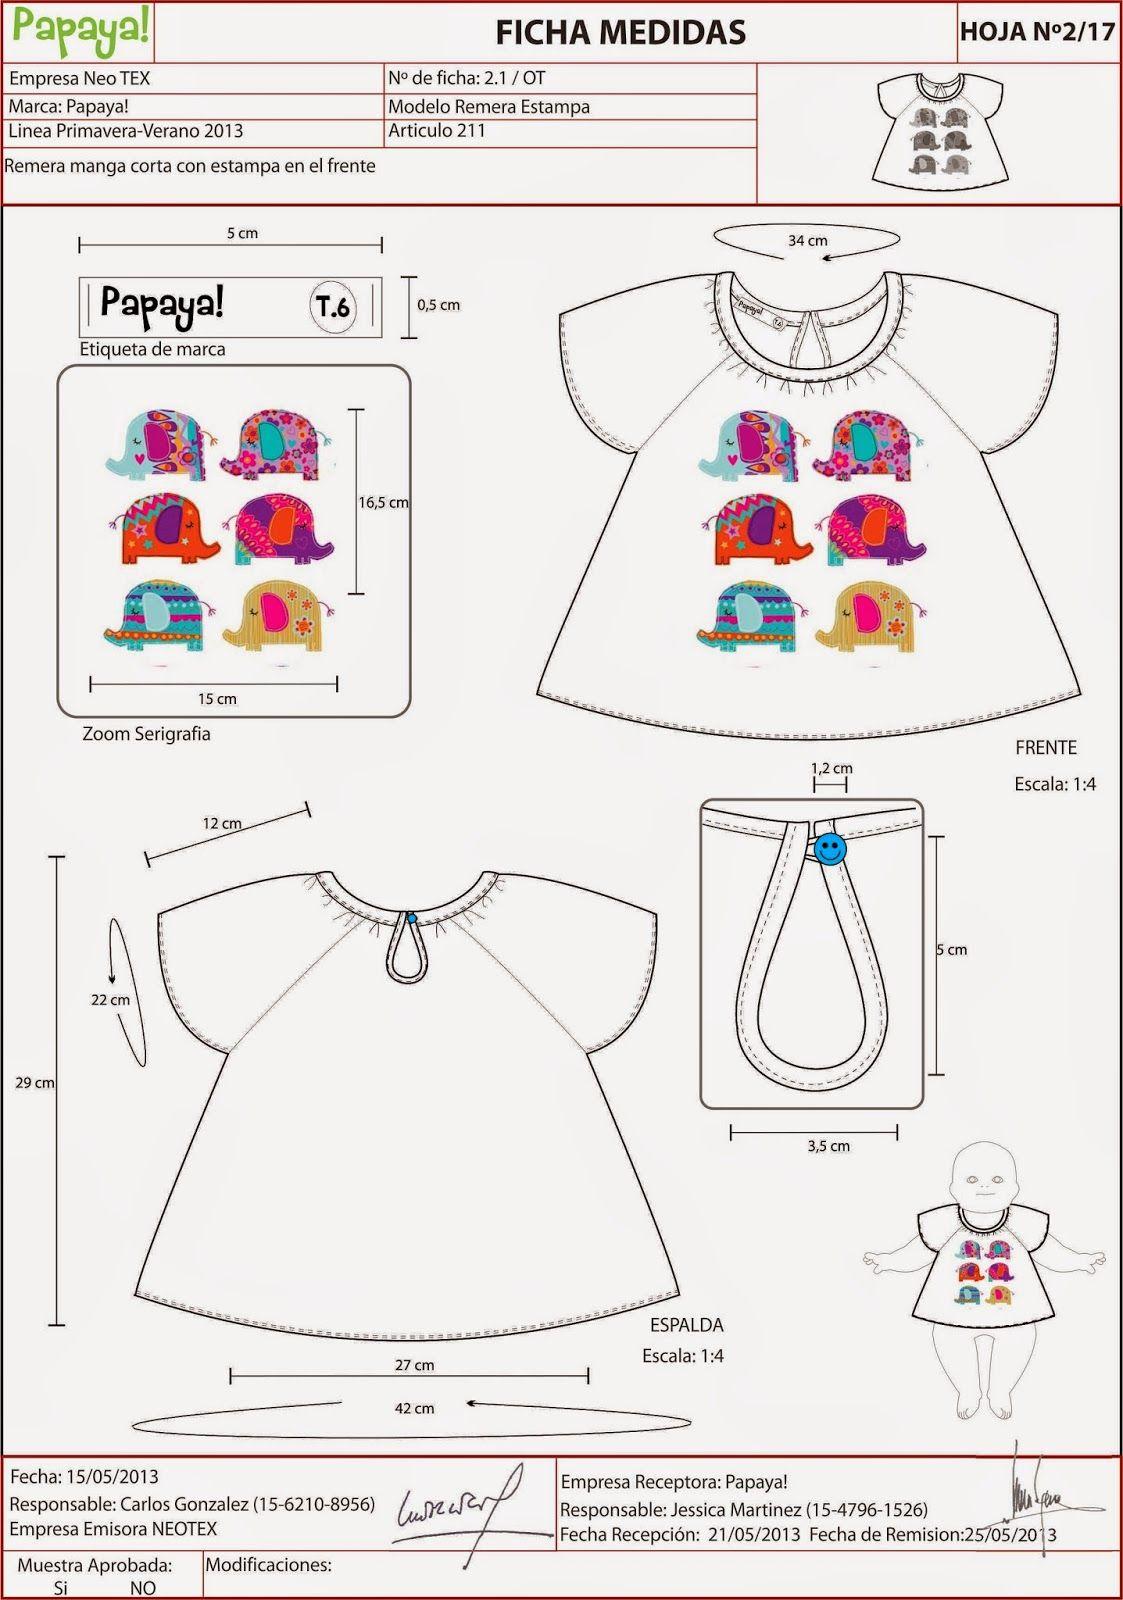 FICHAS+TP+NIÑOS talla6meses   Patronaje Infantil   Pinterest   Baby ...